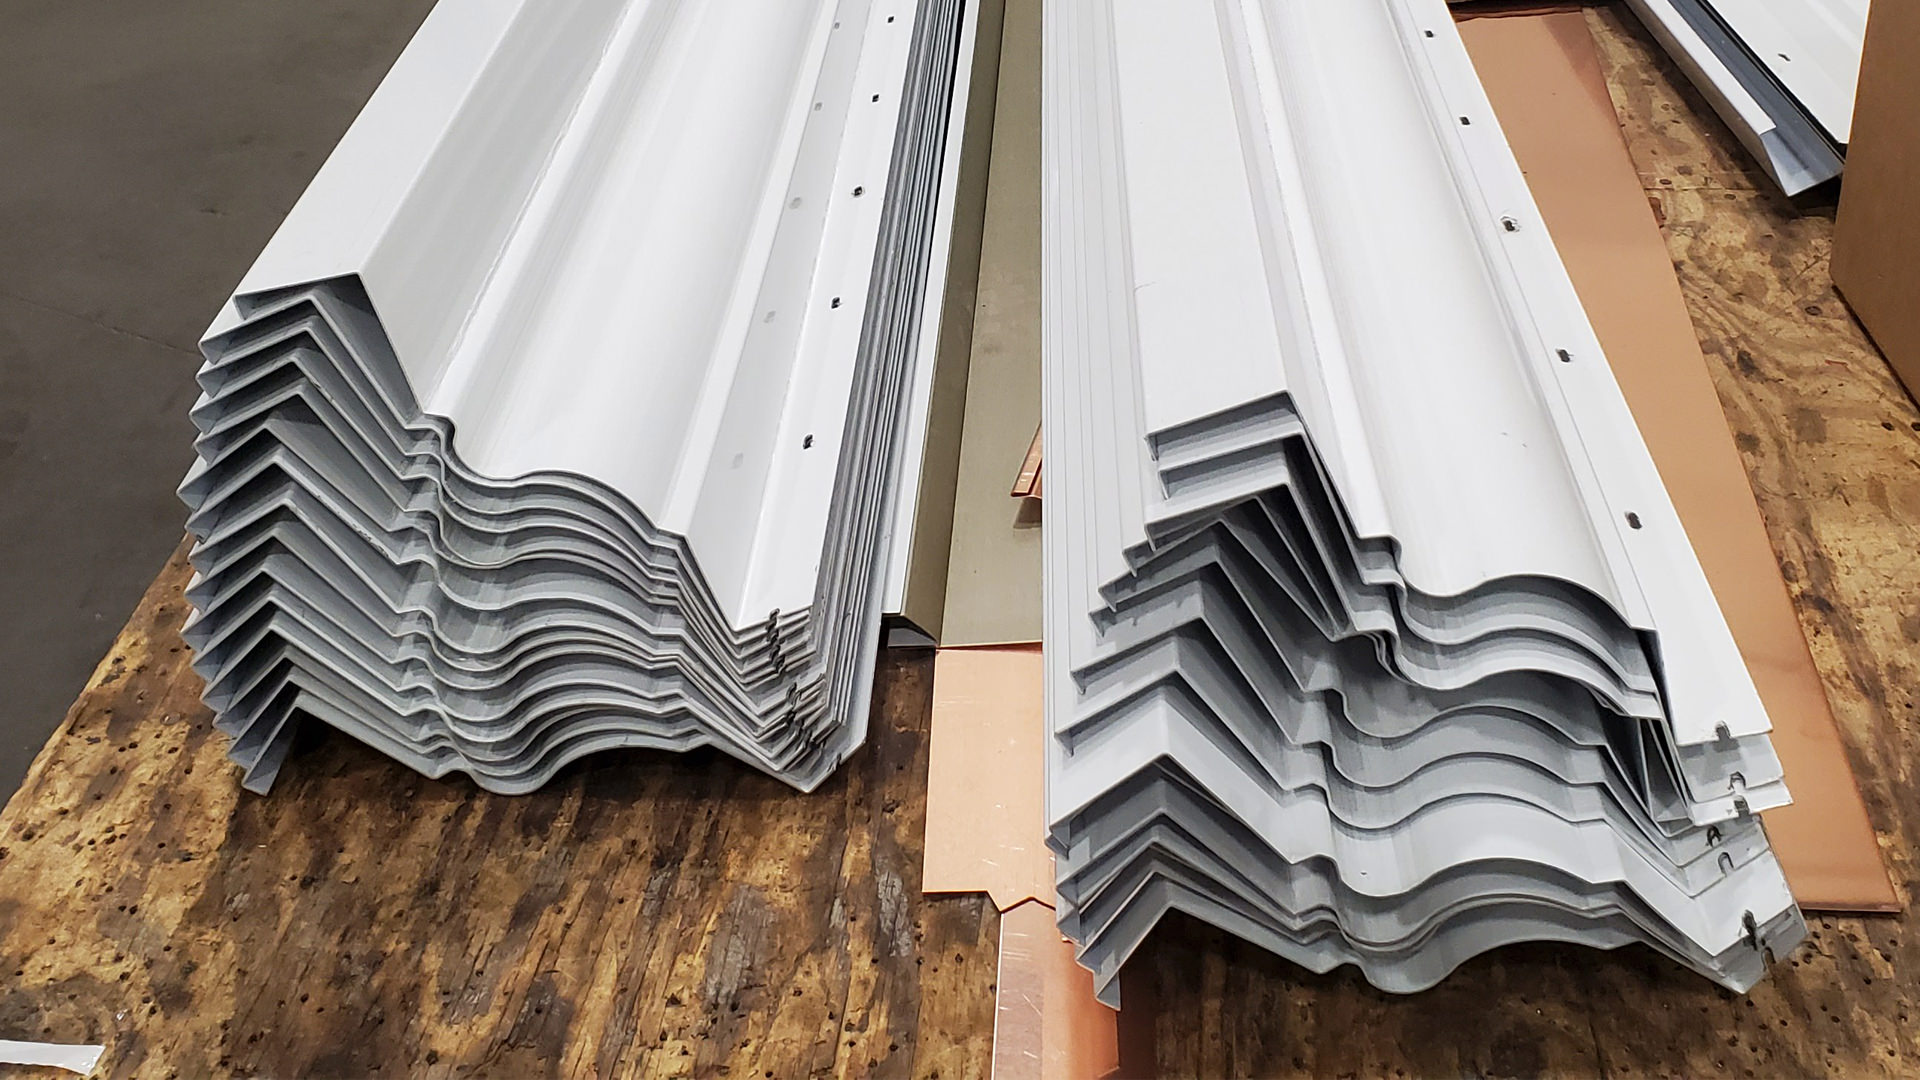 White Kynar aluminum cornice